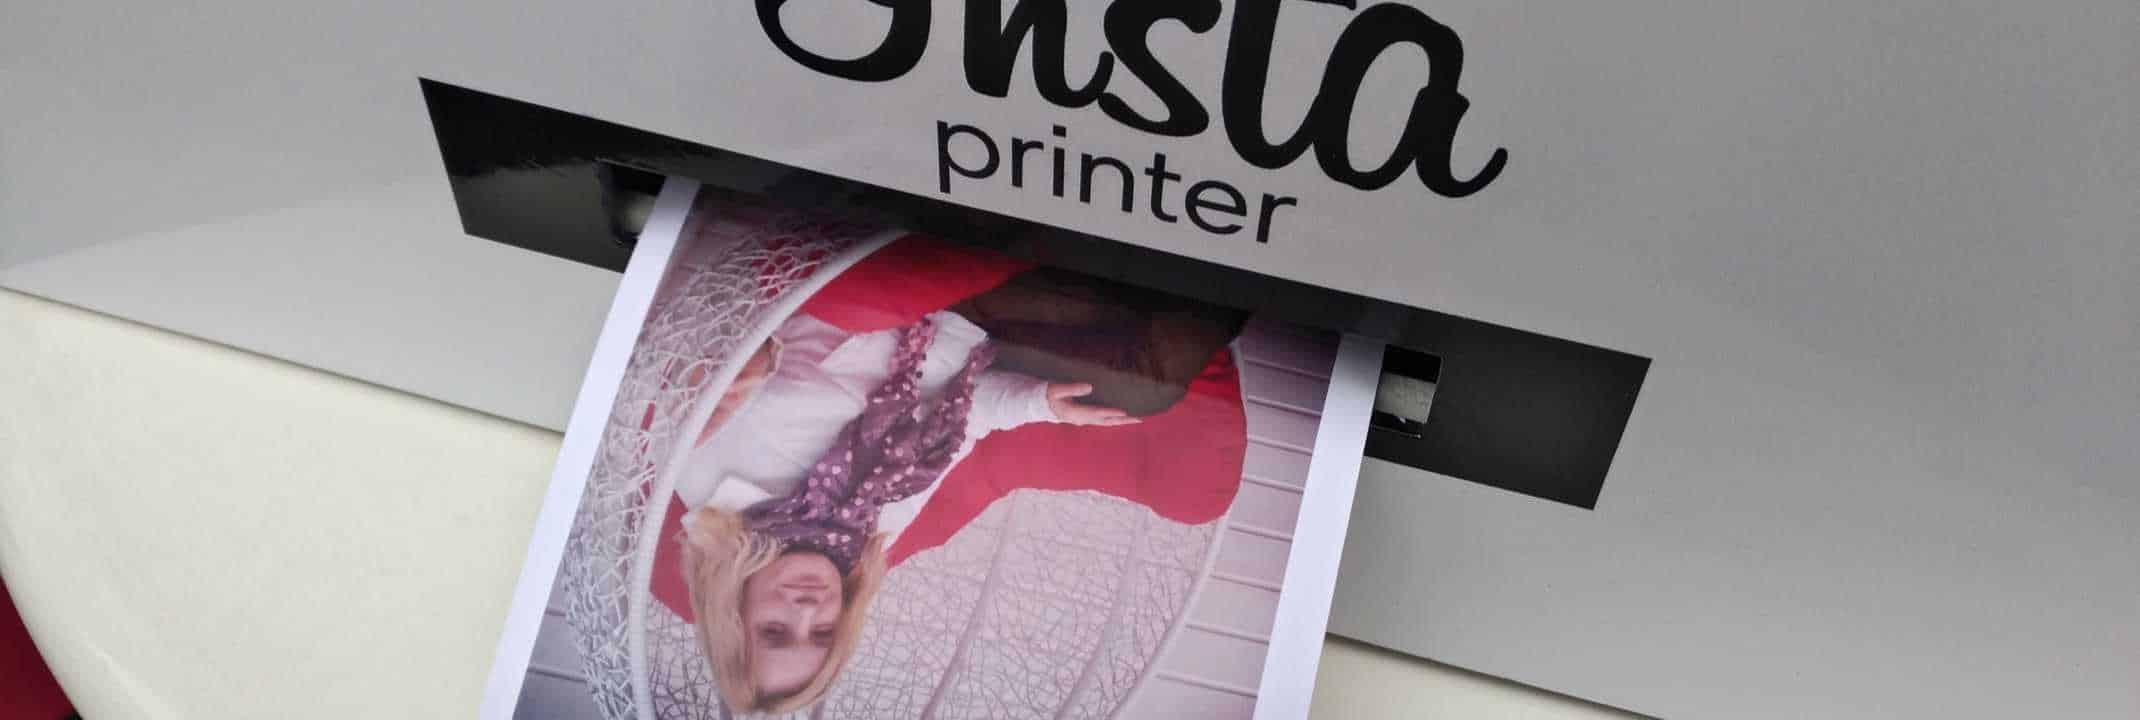 Best inkjet photo paper 2014 9 Best Free Image Editors - Mashable